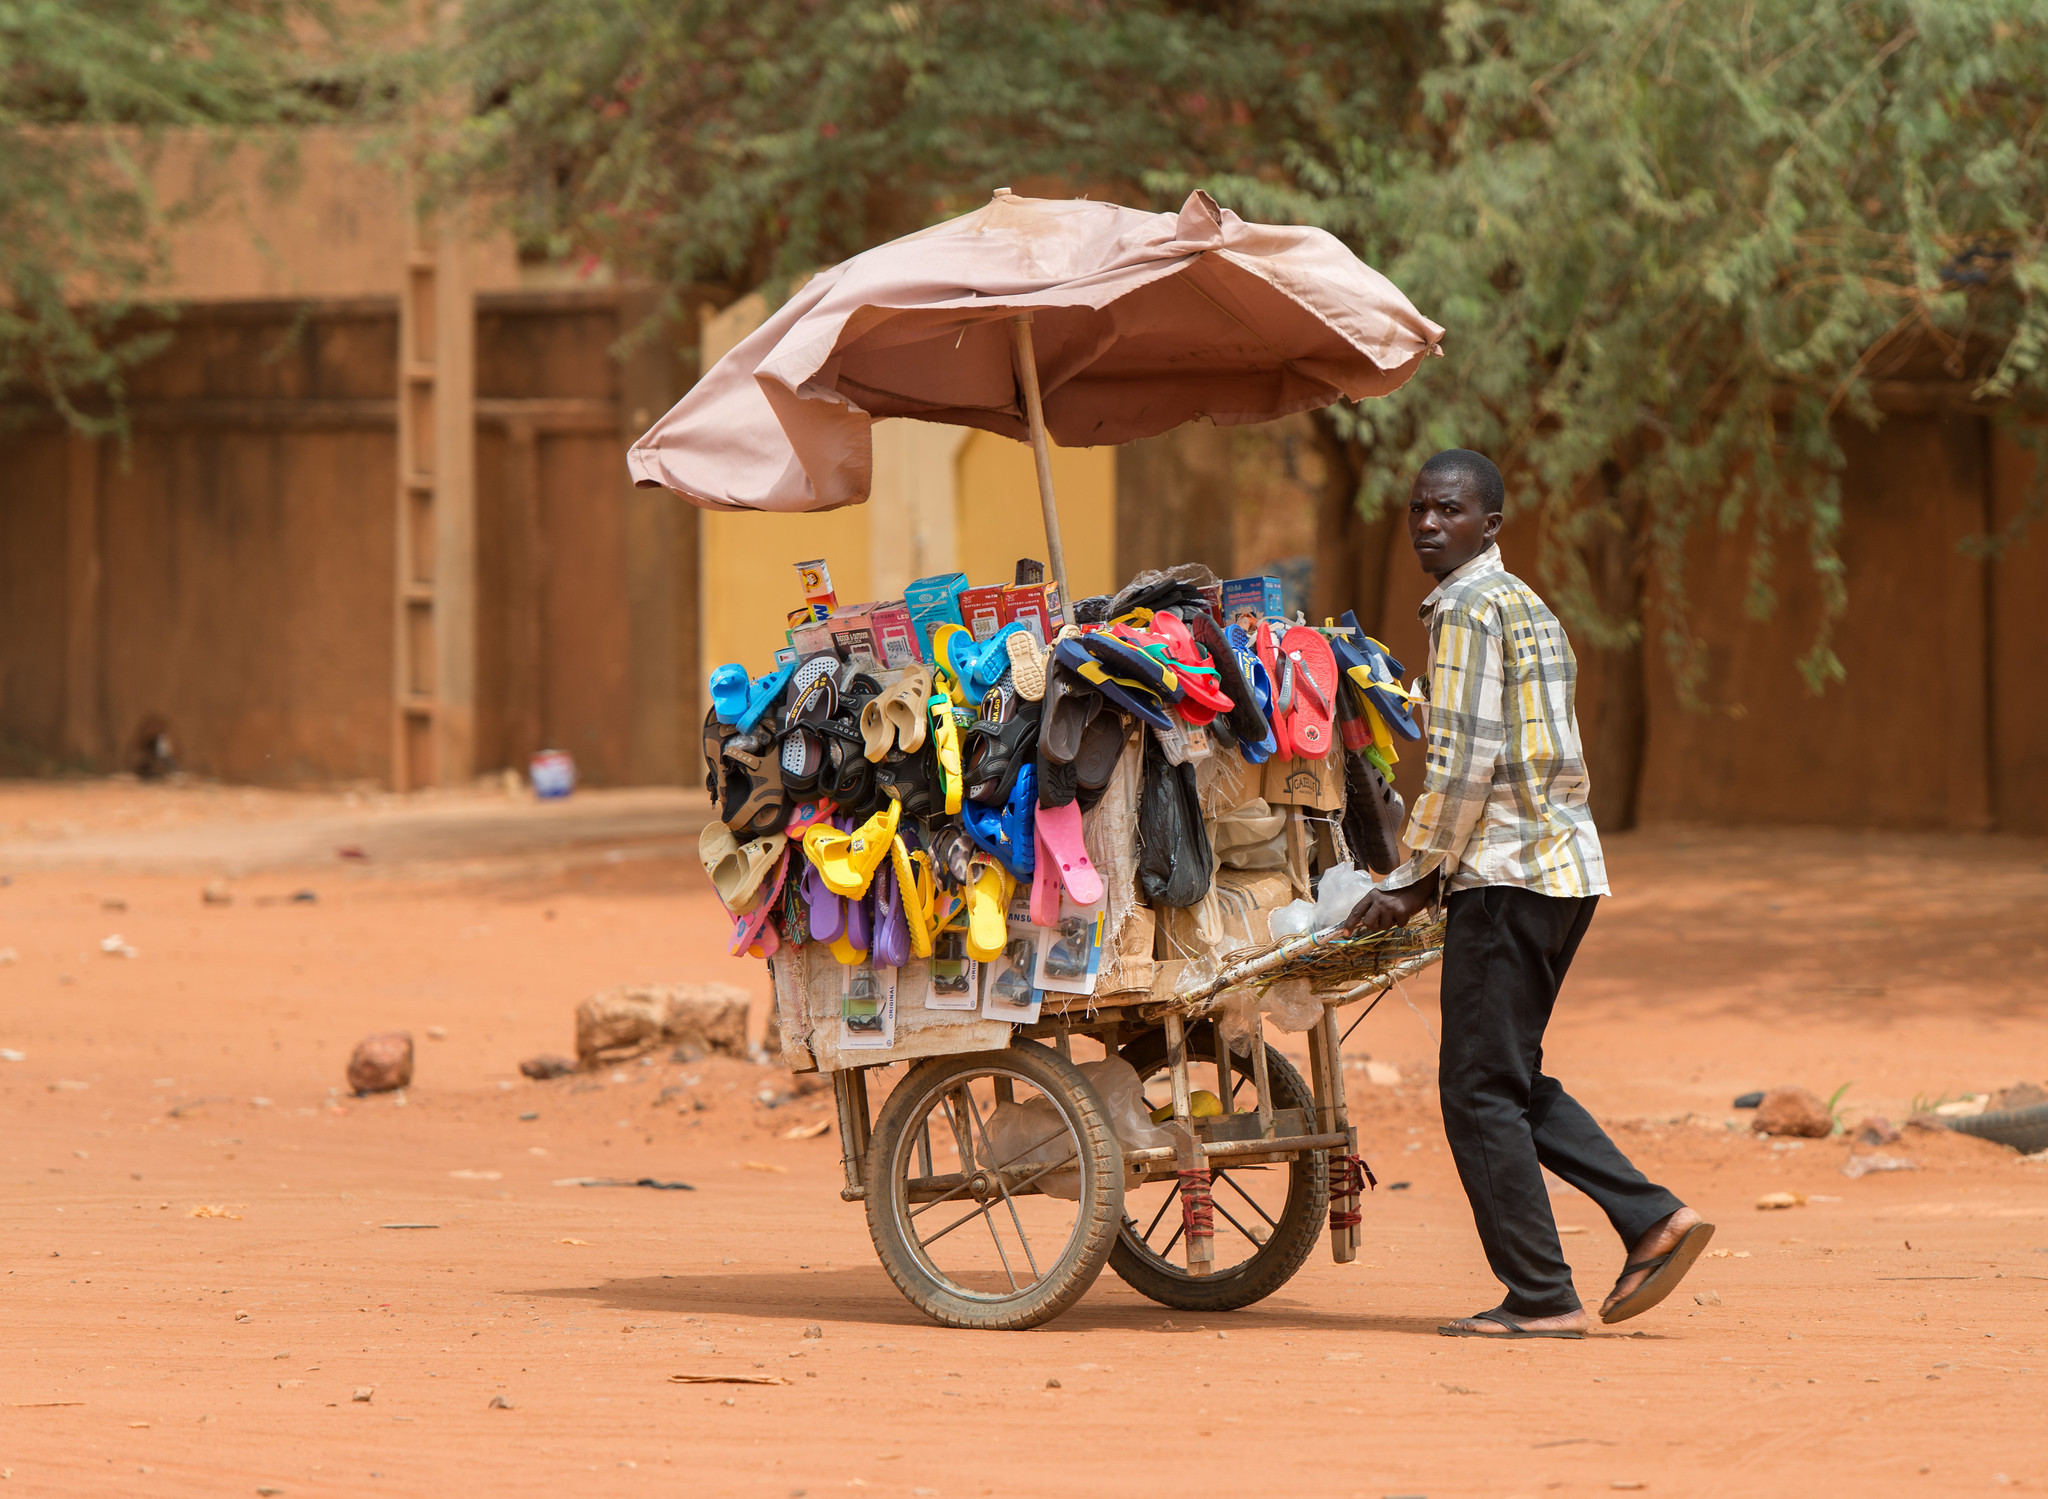 Street Shoe Seller